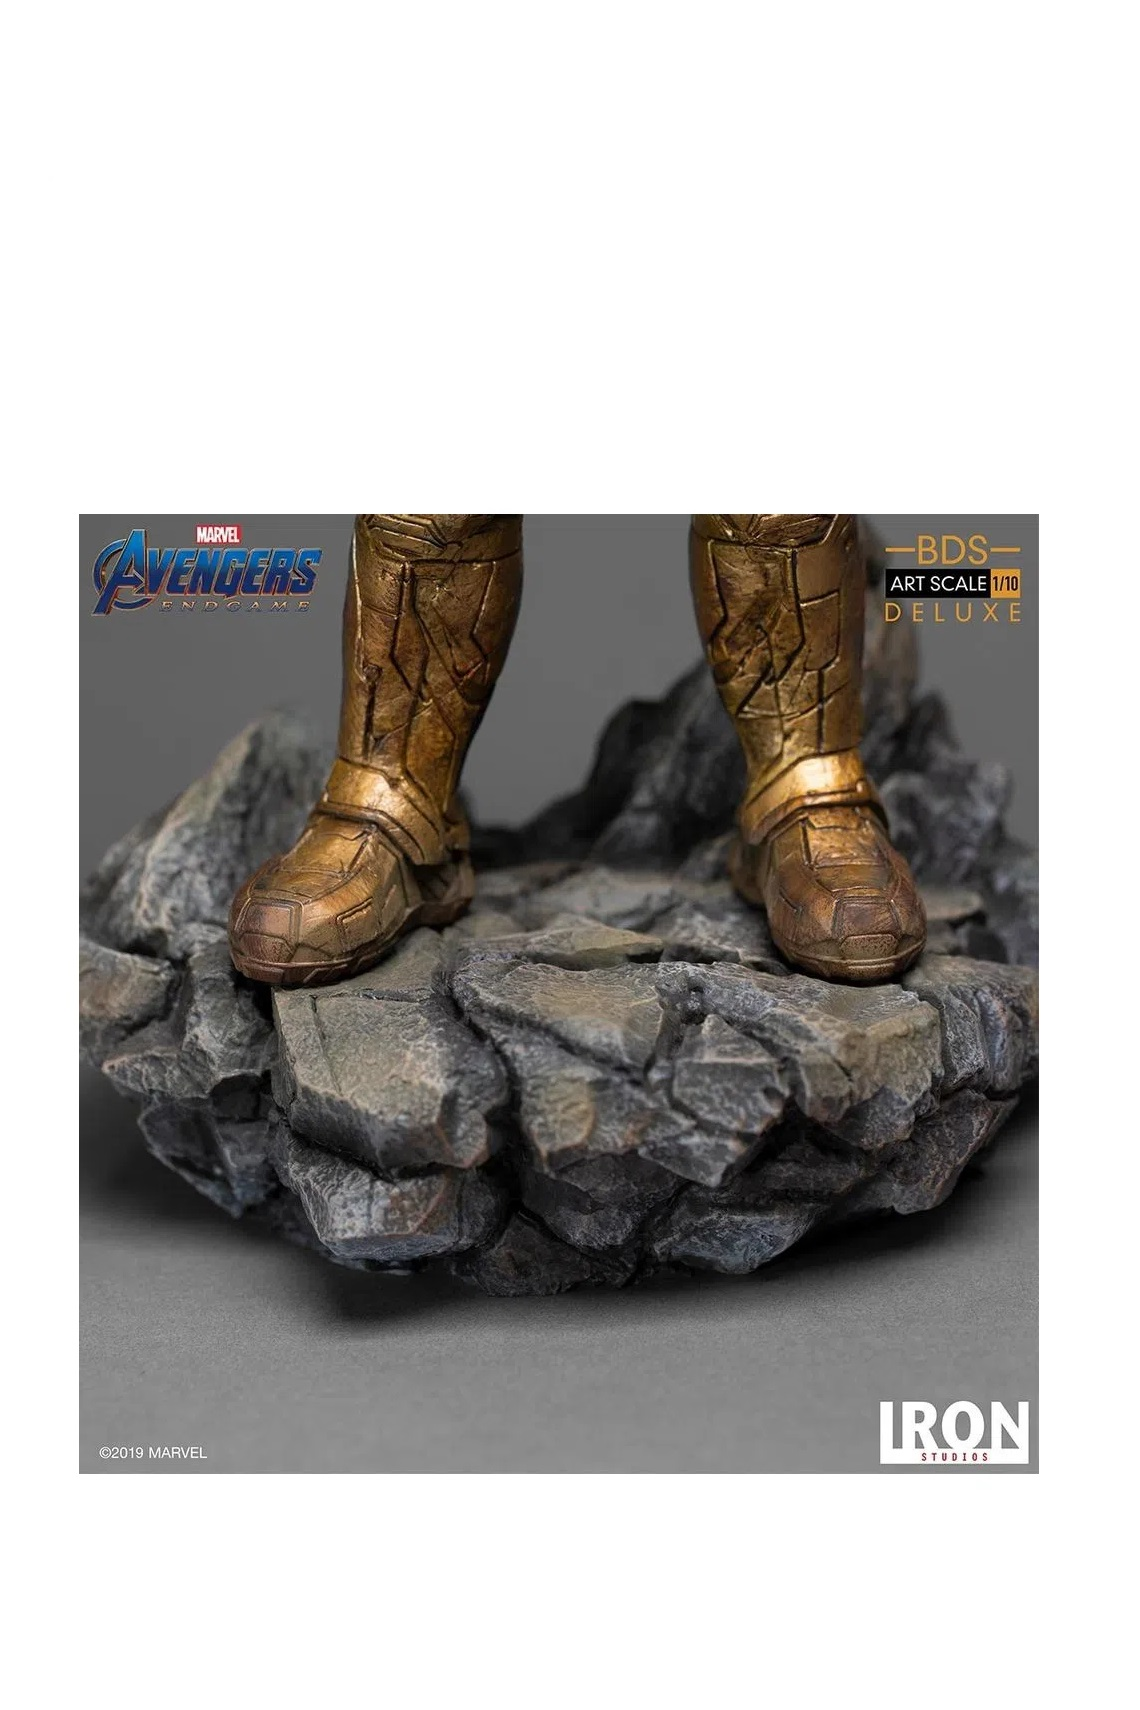 Estátua Thanos Black Order - Avengers: End Game - Art Scale 1/10 - Iron Studios